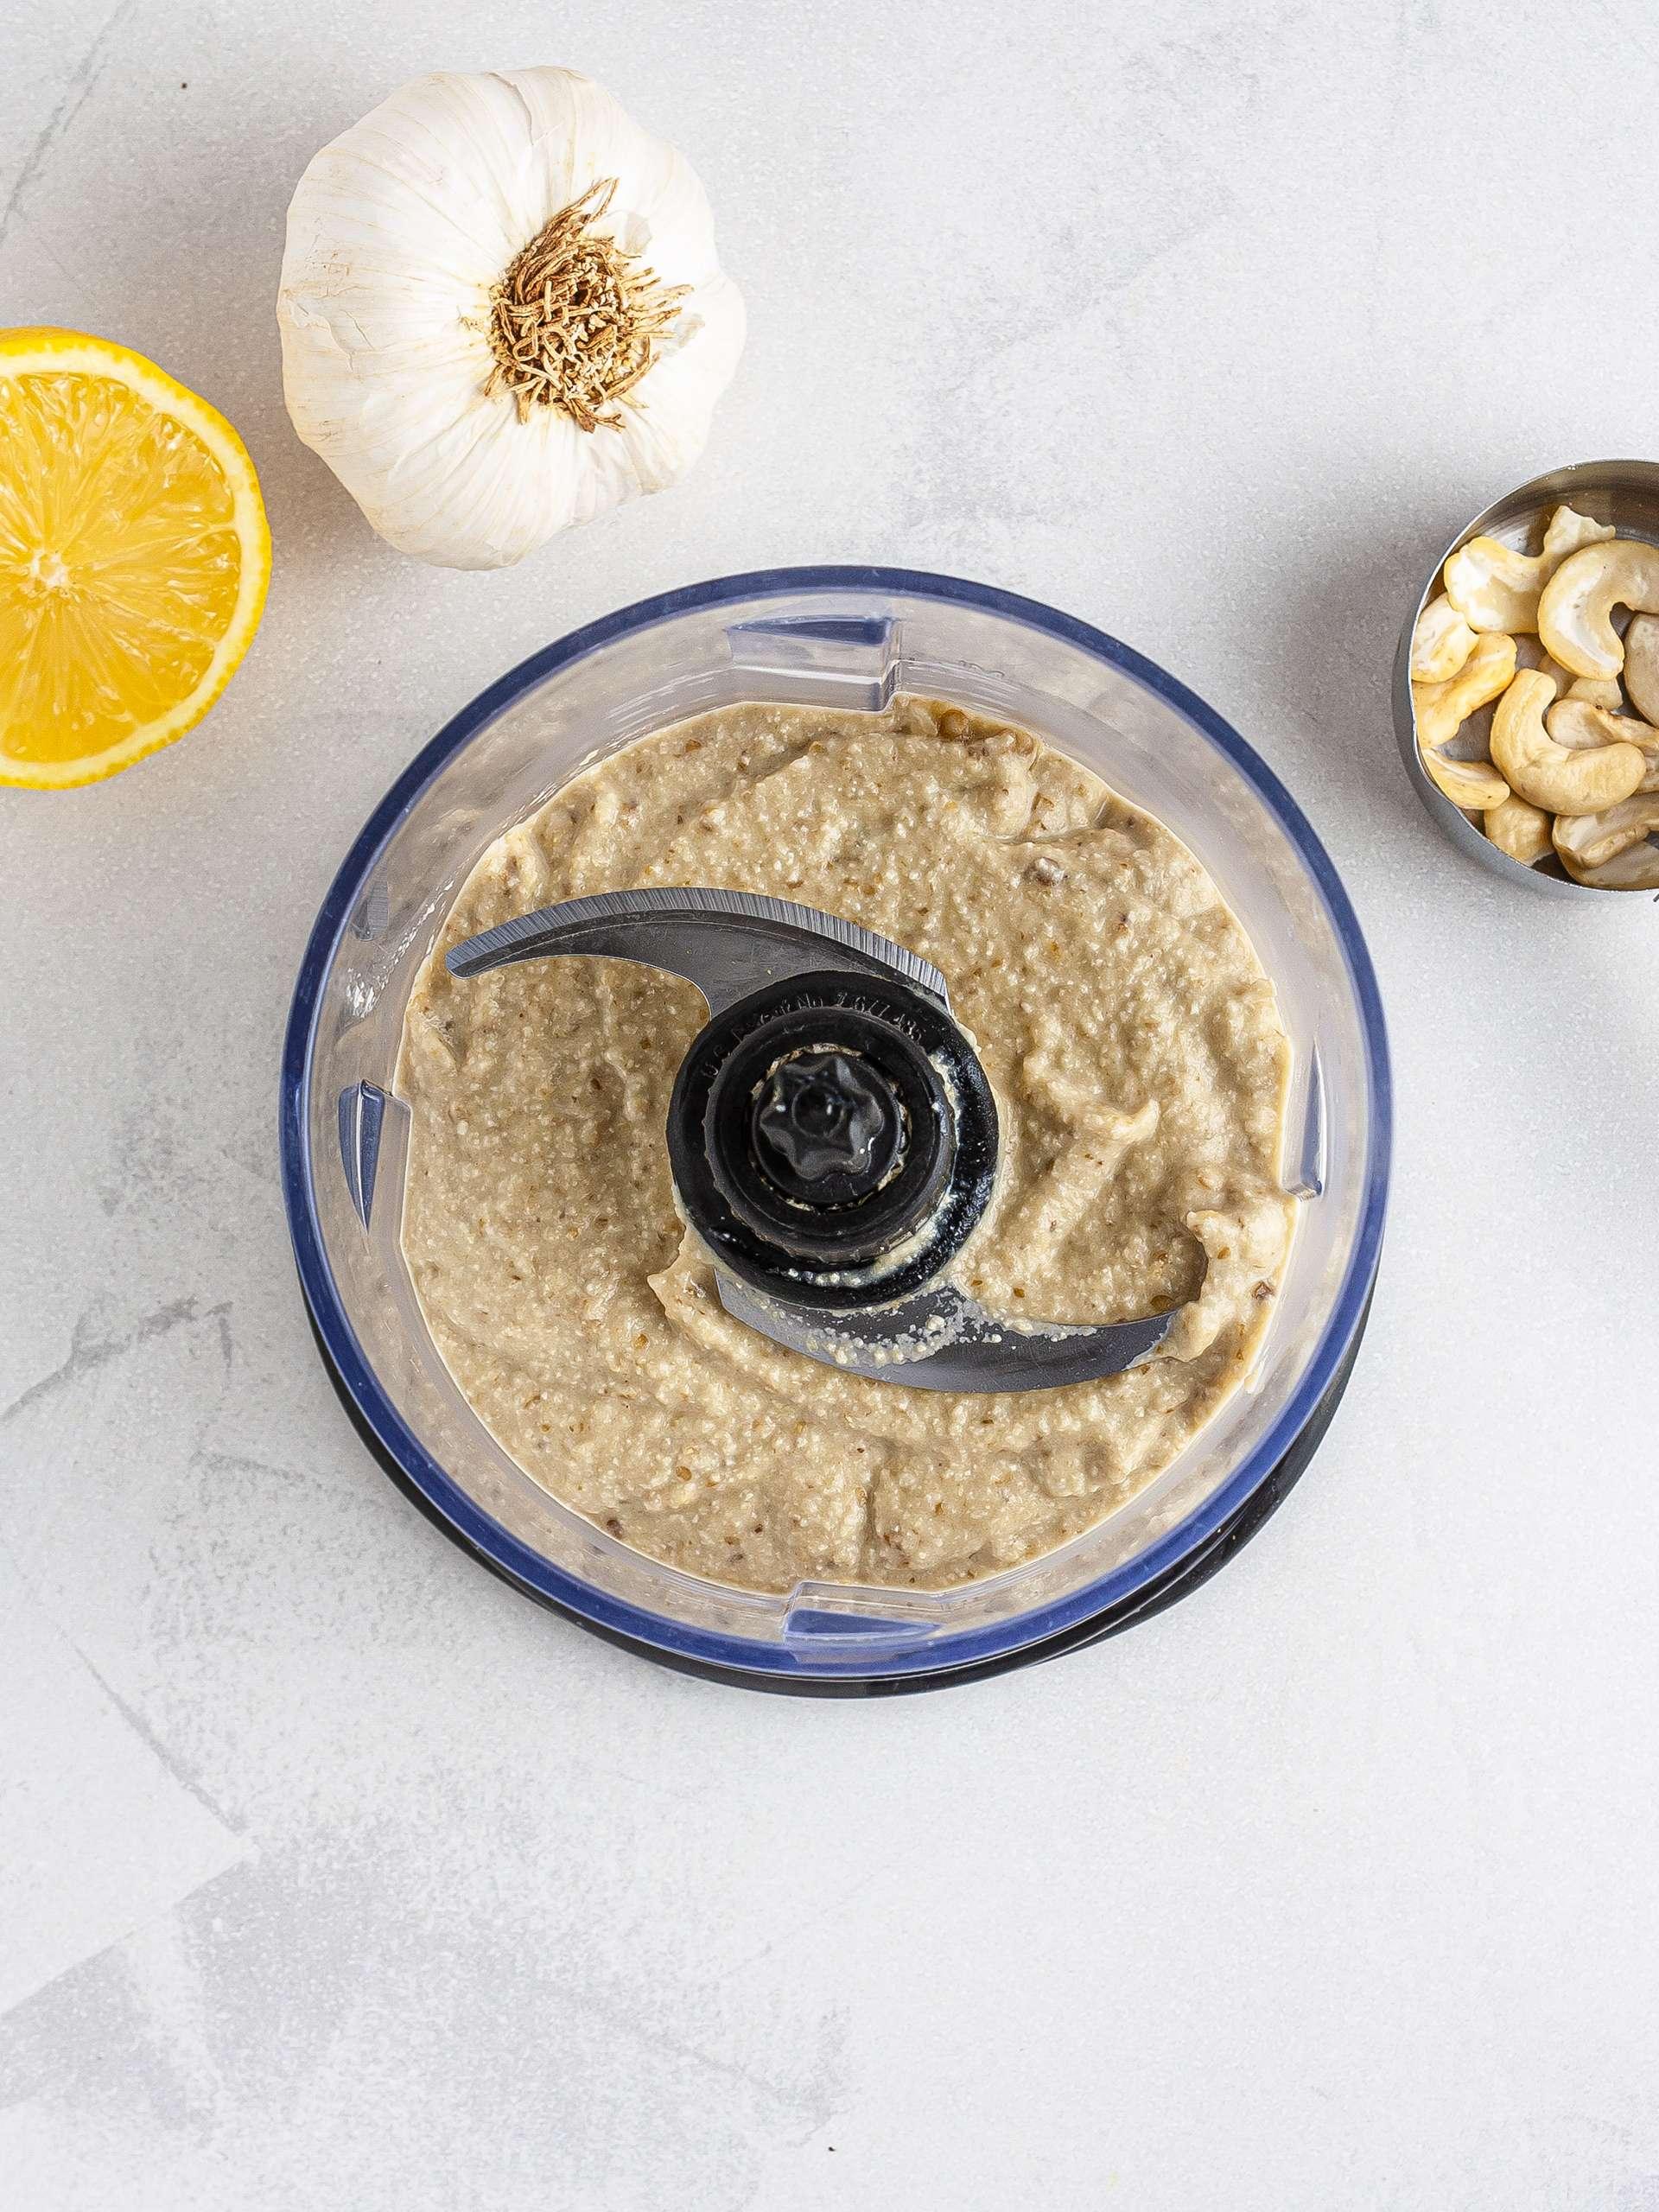 Aubergine blended with cashews garlic and lemon